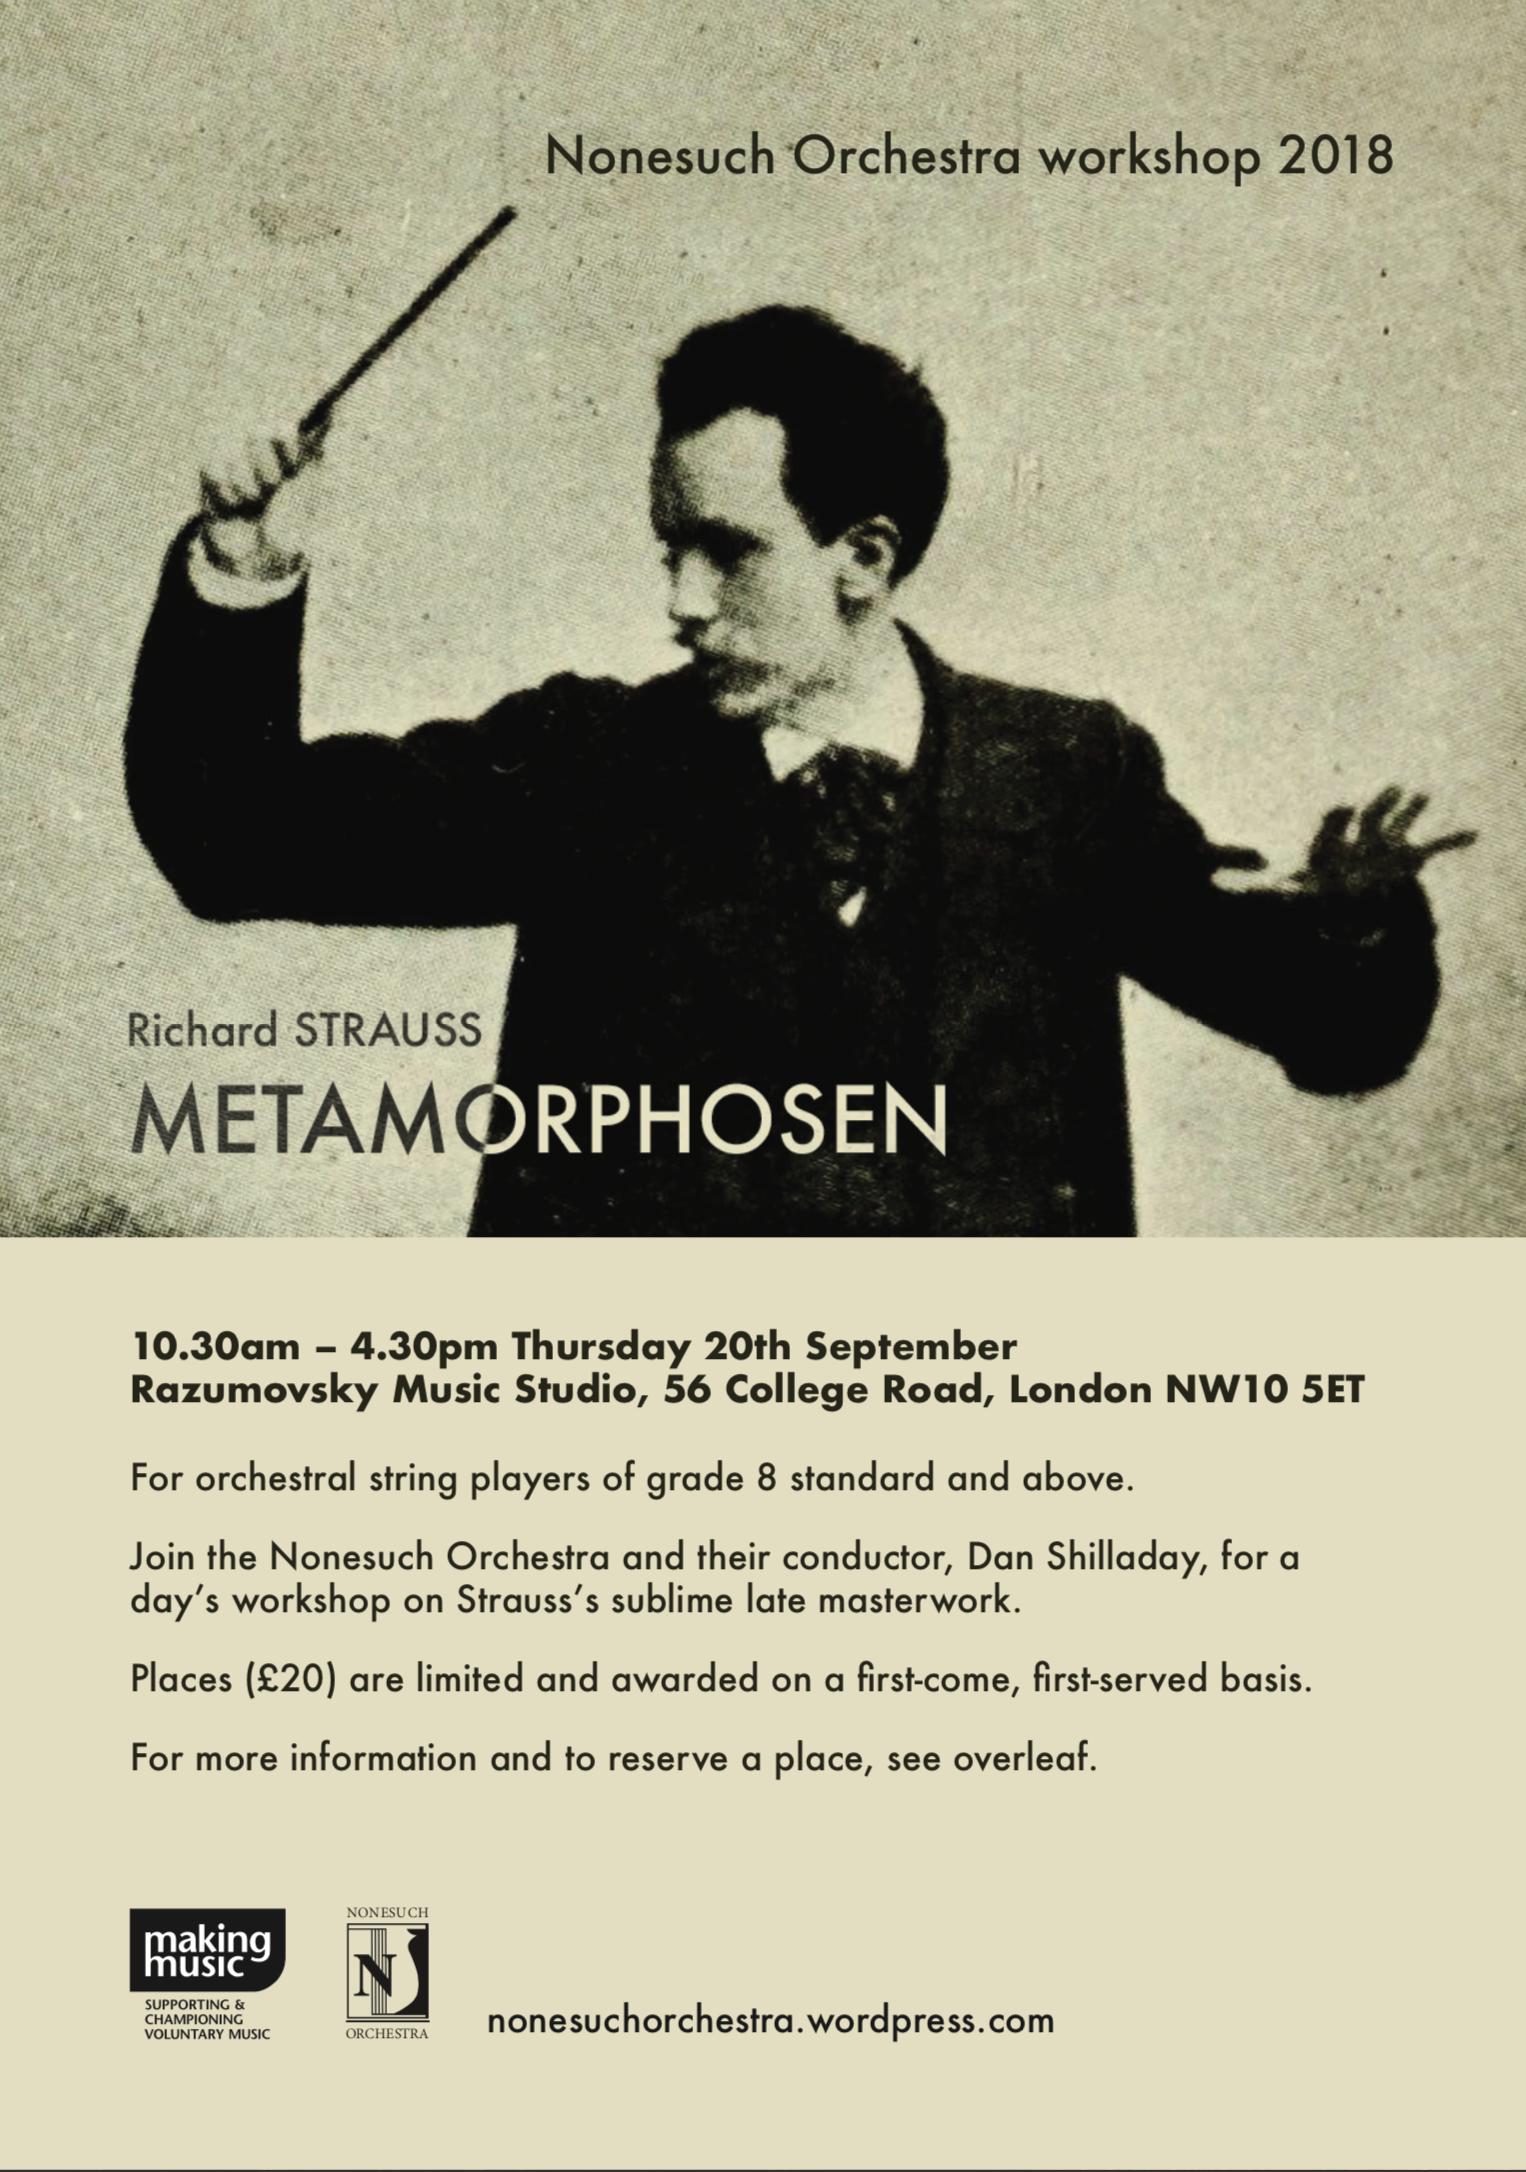 metamorphosen-flyer.png